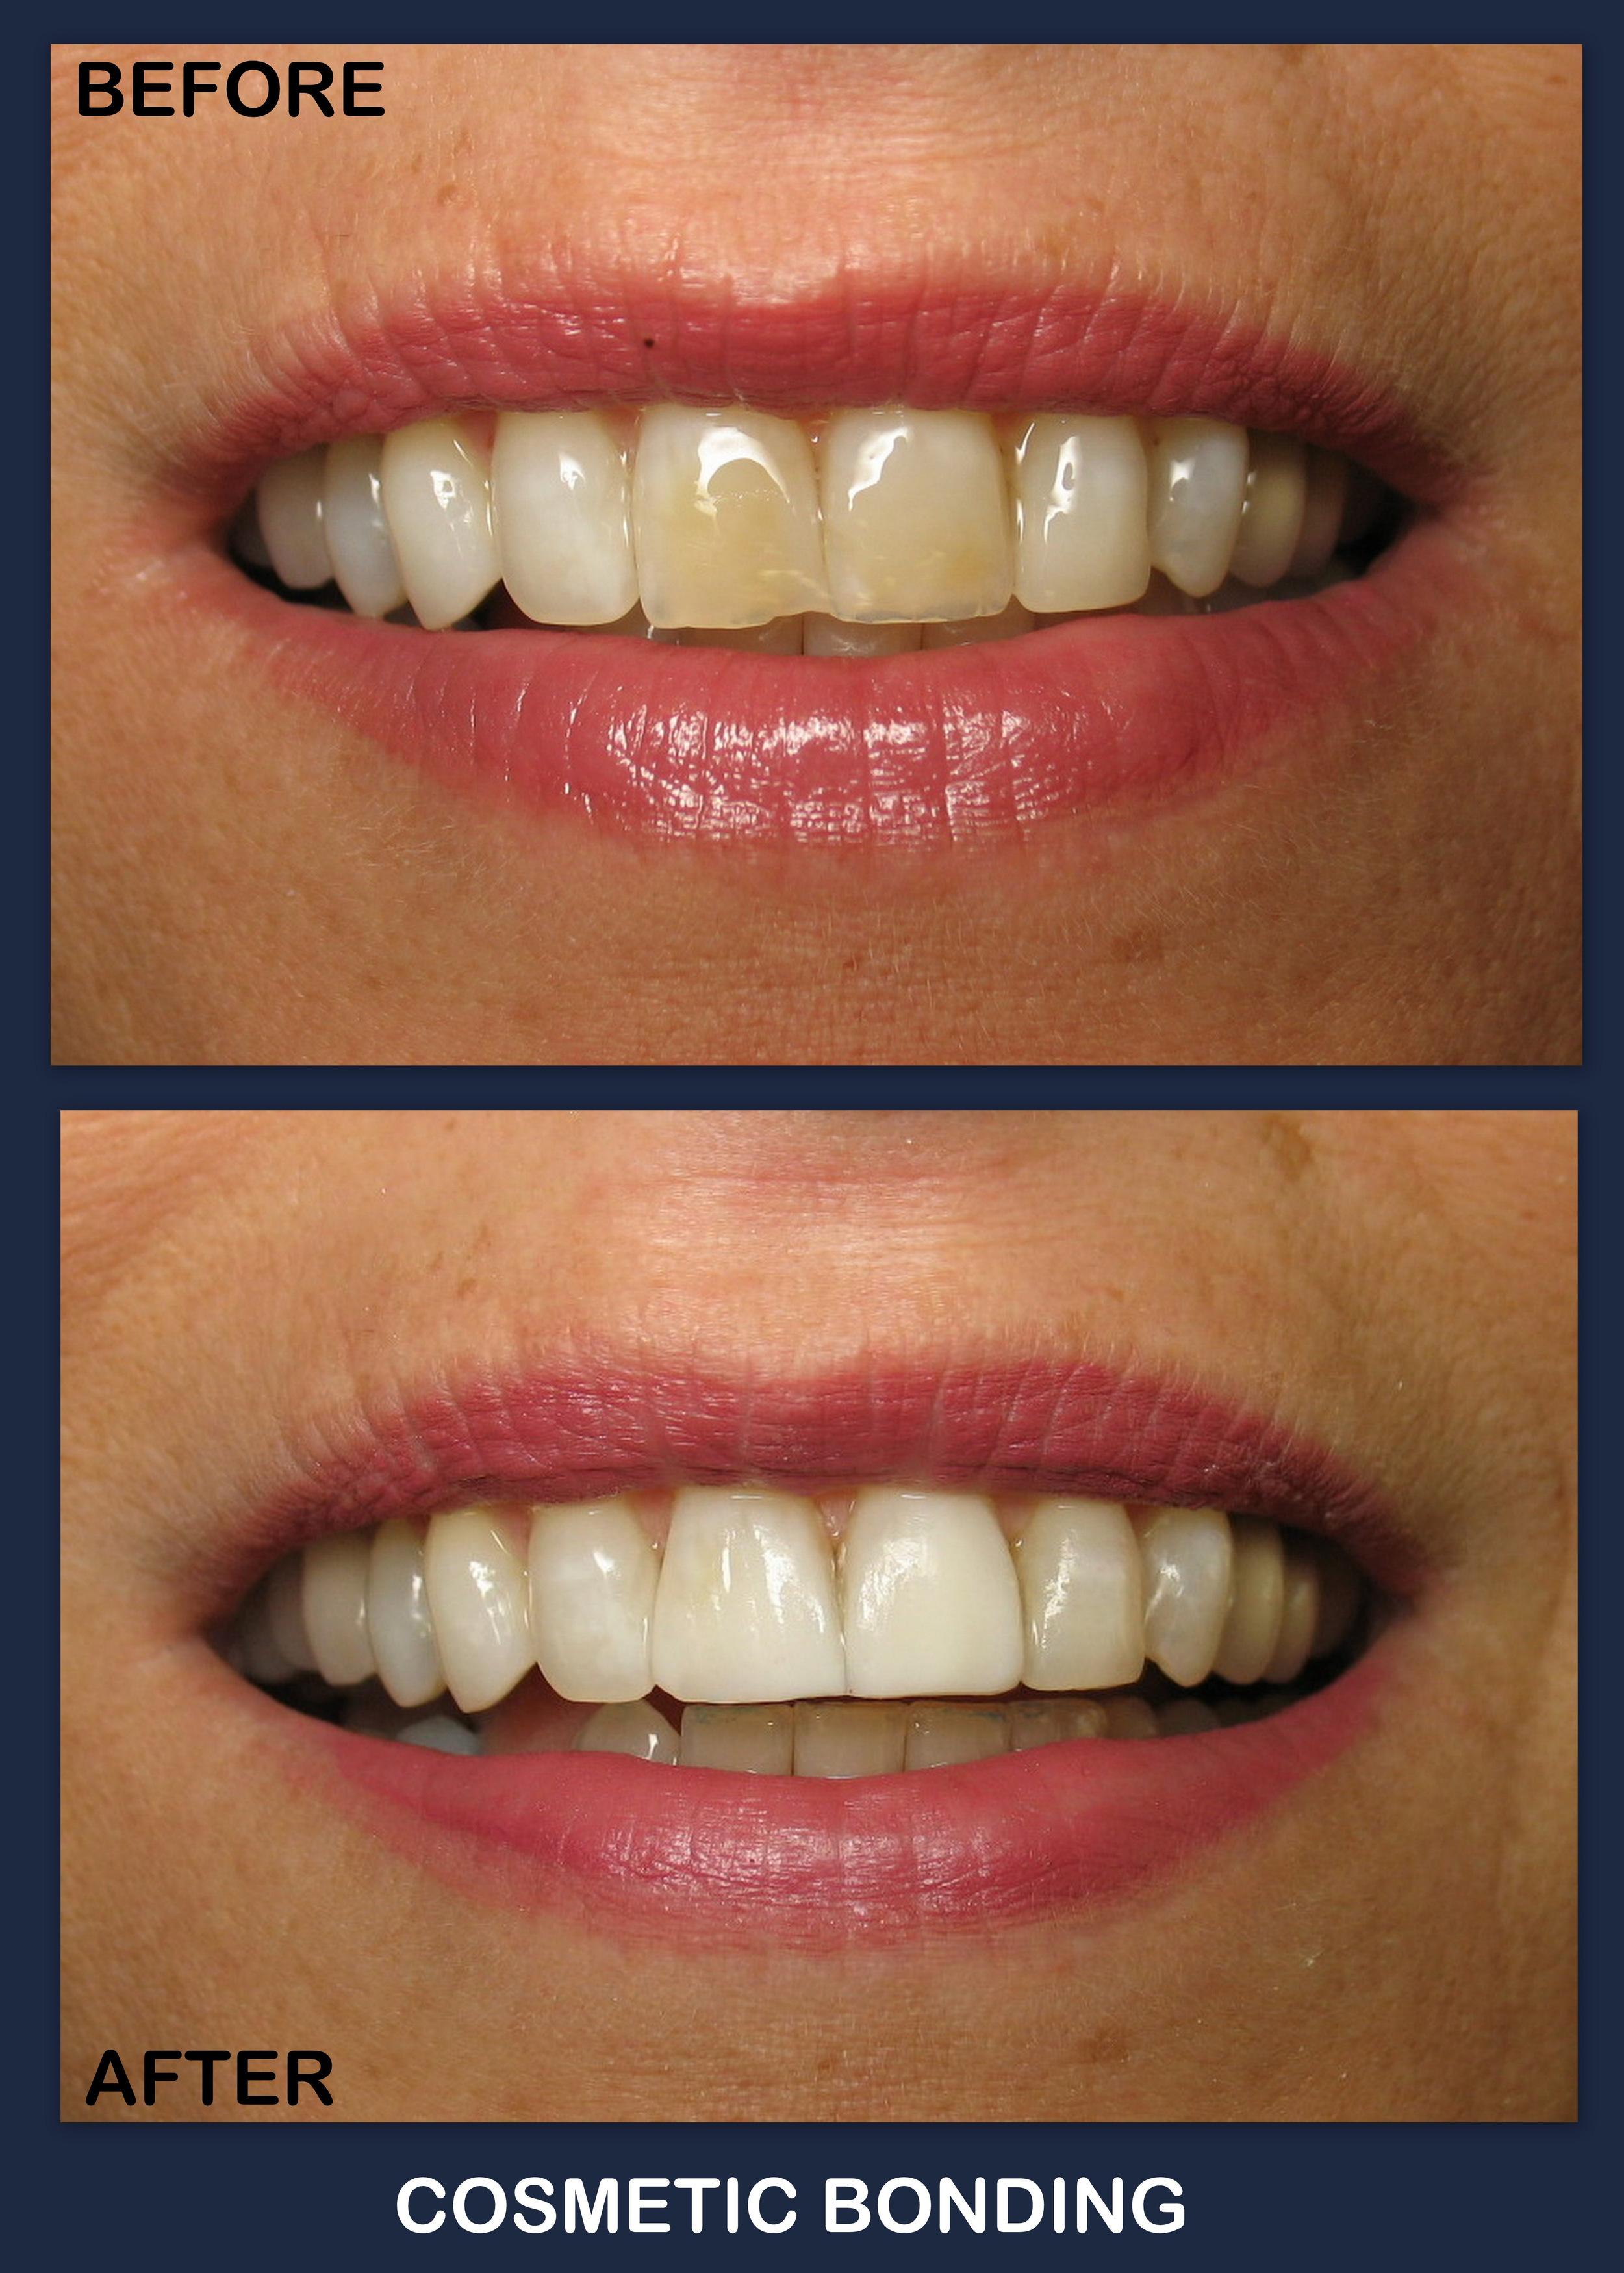 Cos Bdg  (To Whiten teeth).jpg